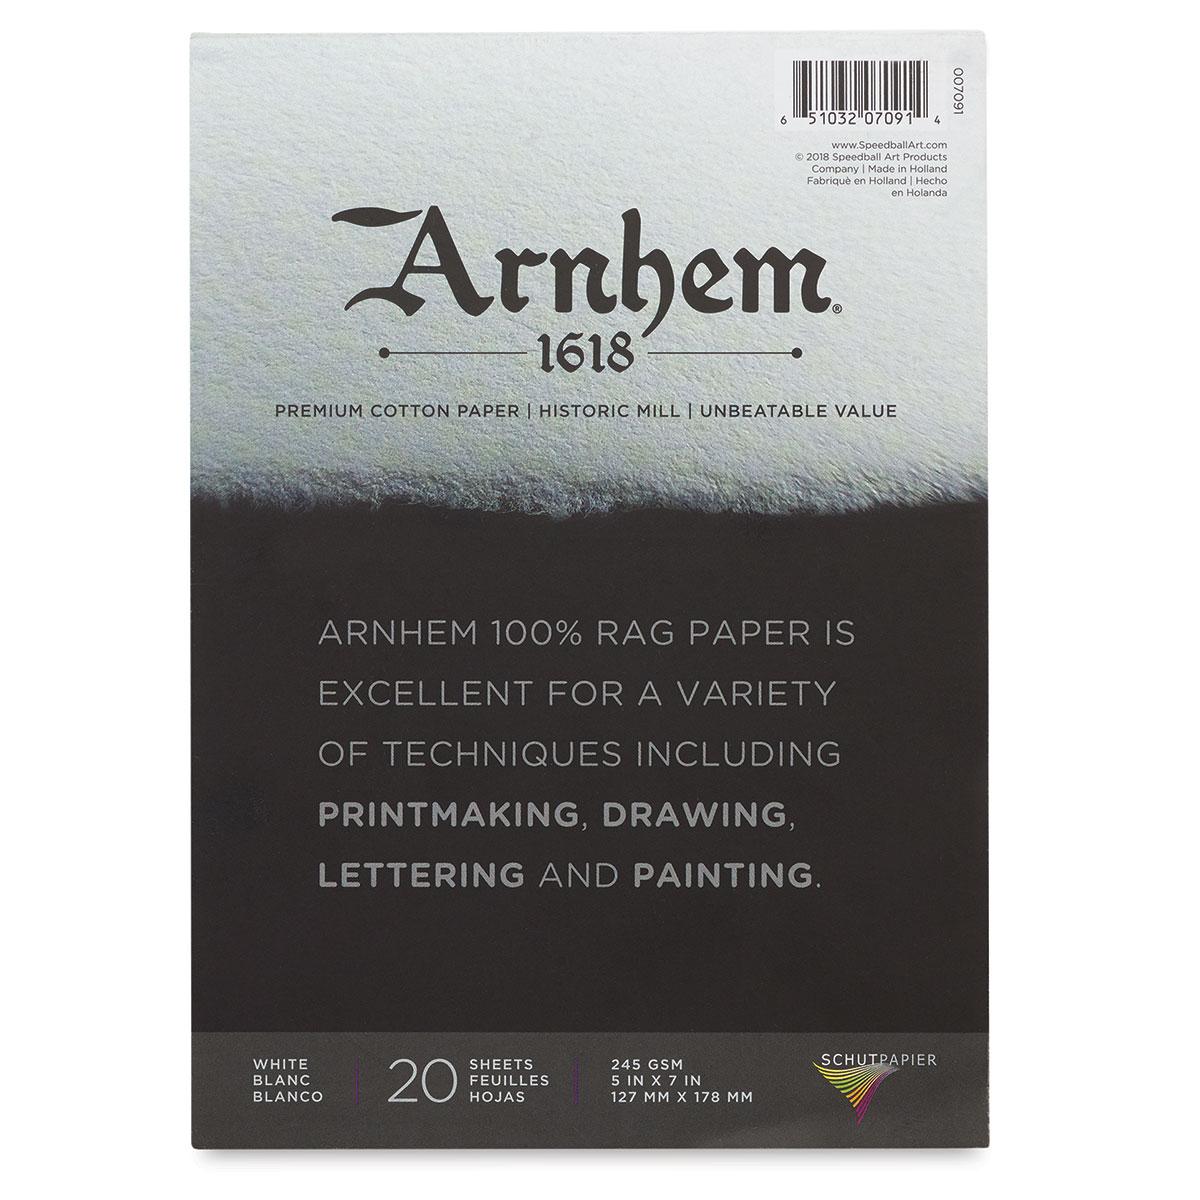 Arnhem 1618 Paper Pad by Speedball - 5 x 7, 20 Sheets